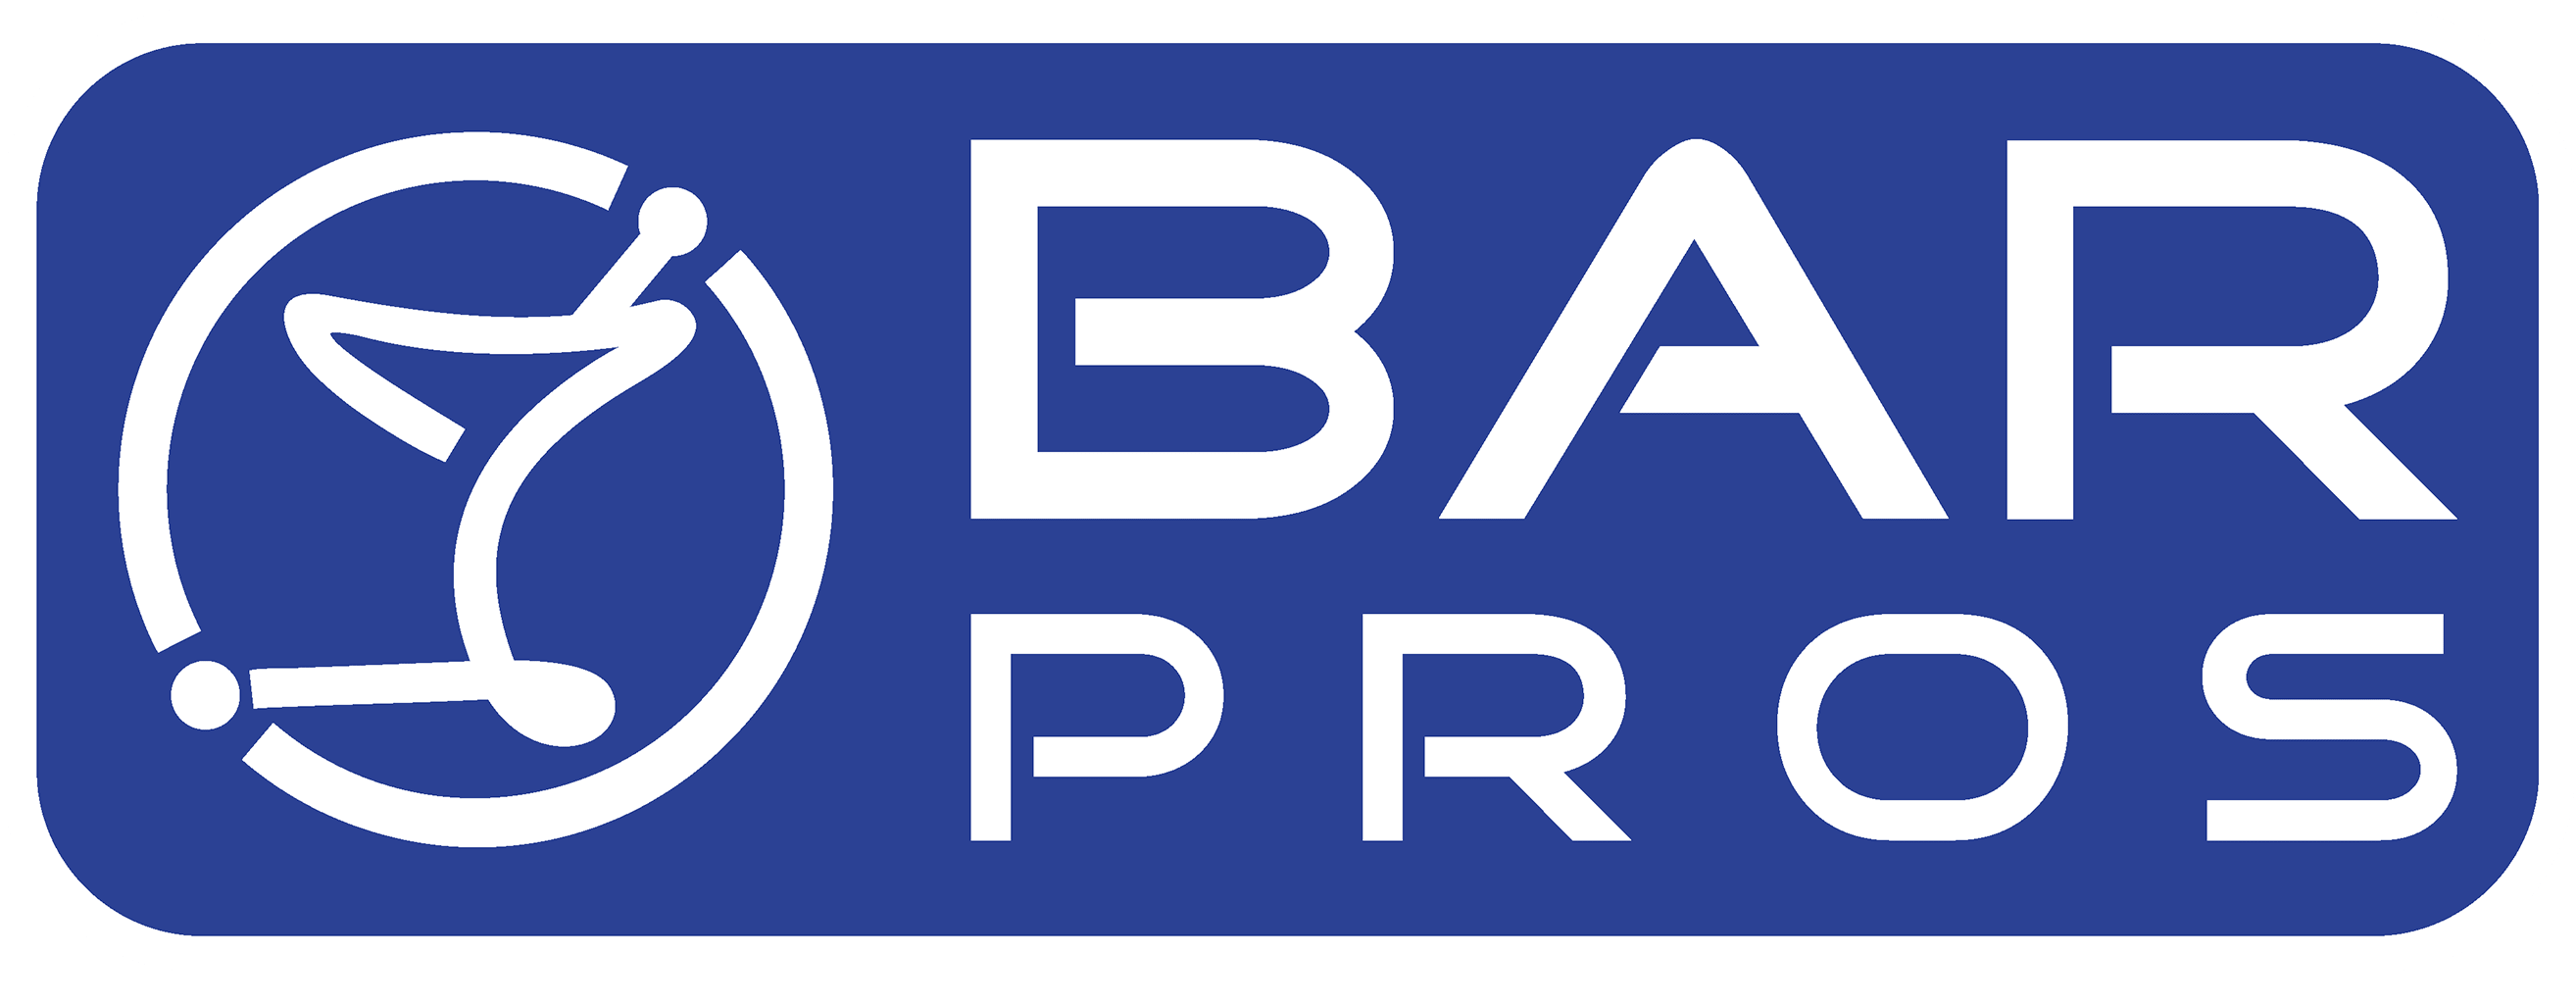 BarPros - Bar Pros Bar Products, Bar Supplies, Kitchen Equipment